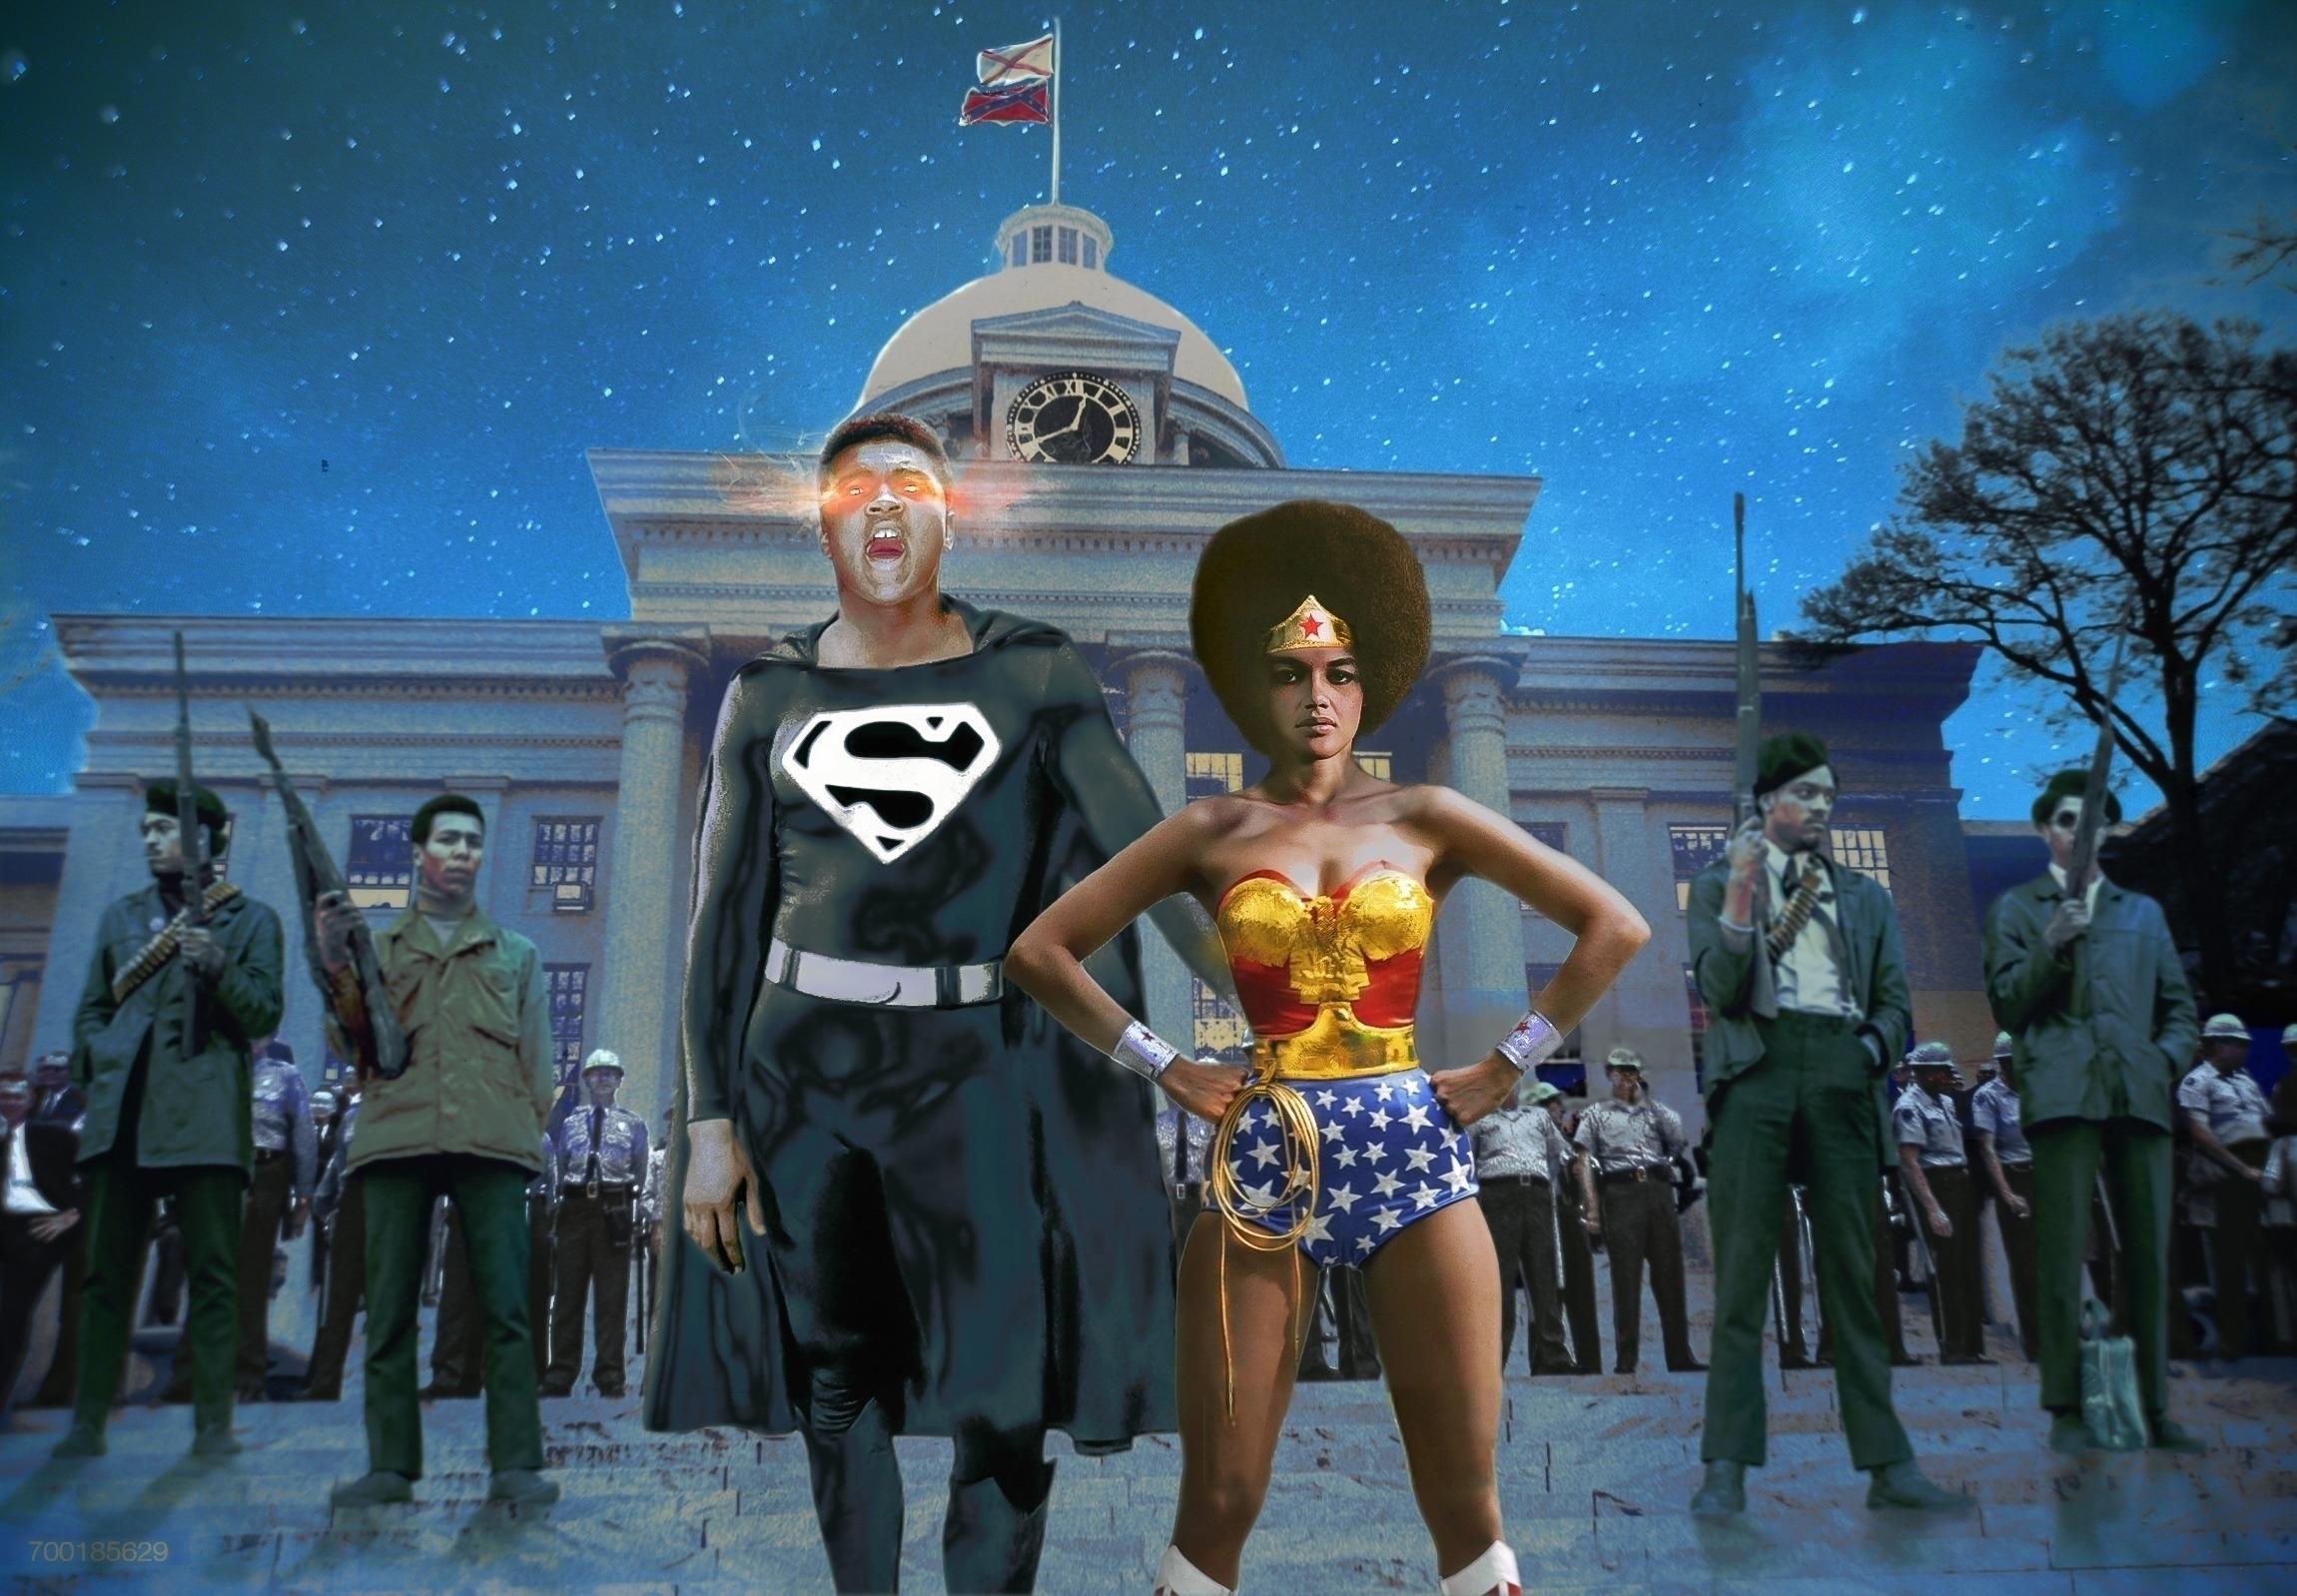 Title: SOCIAL JUSTICE LEAGUE, 1 - iamnotpablo | ello